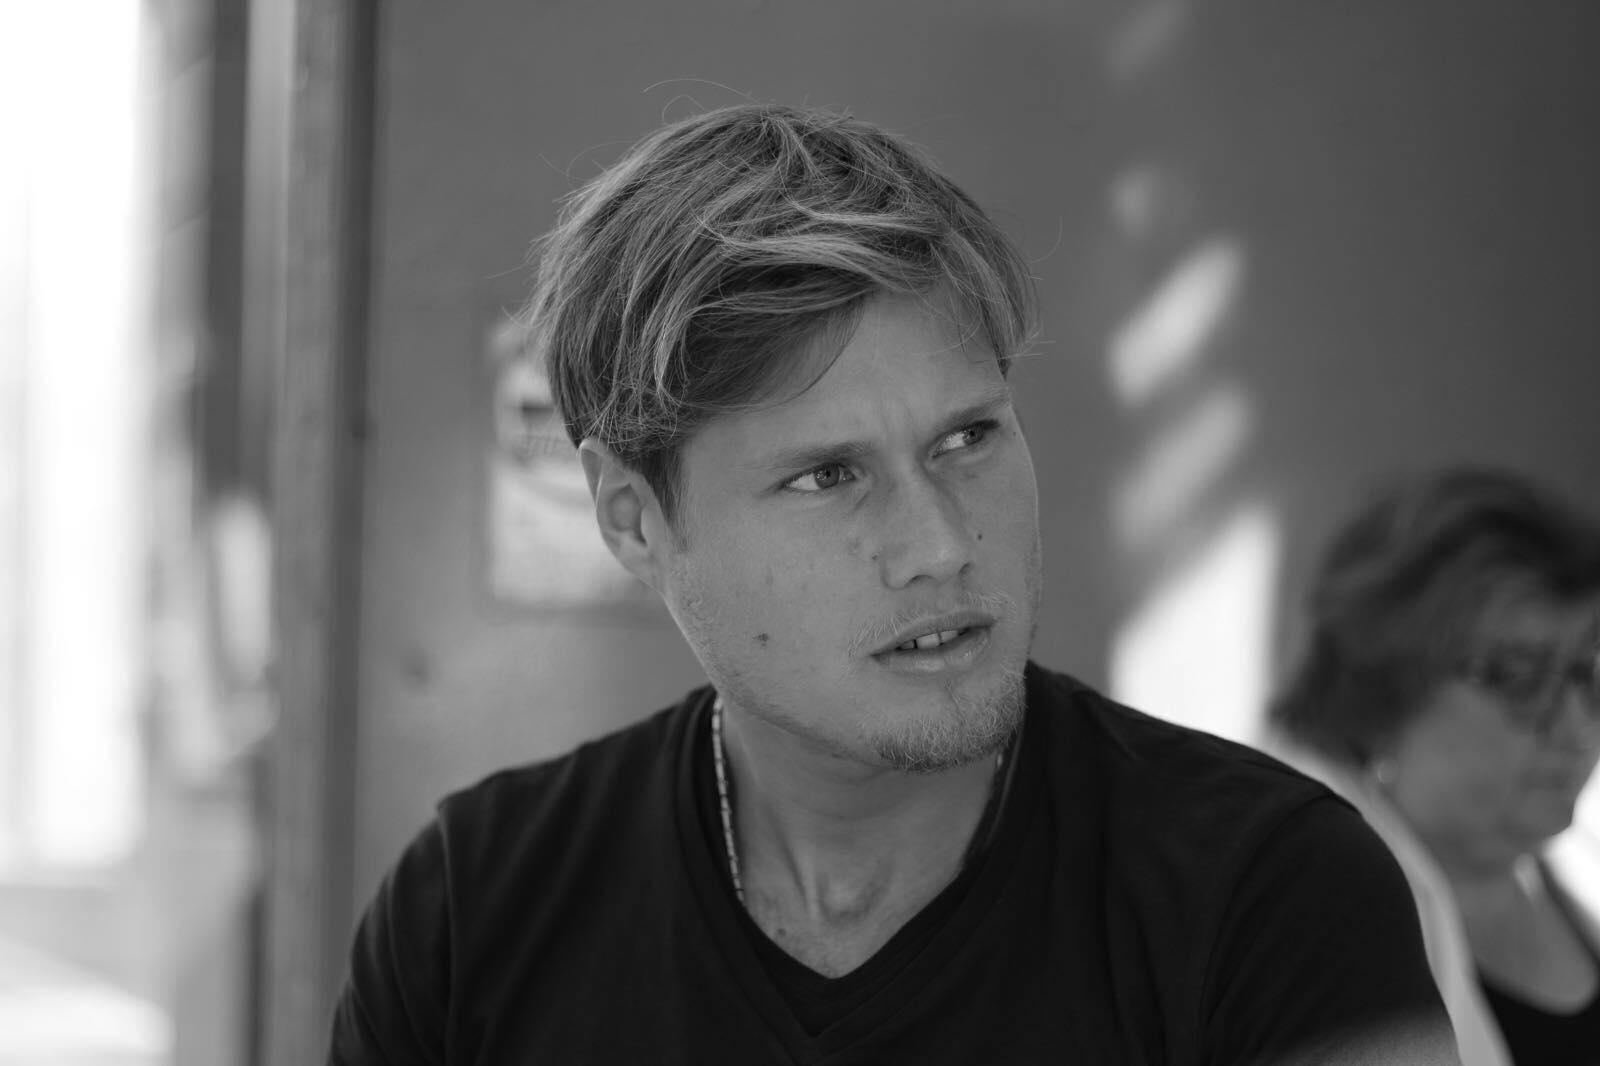 Marco Zander